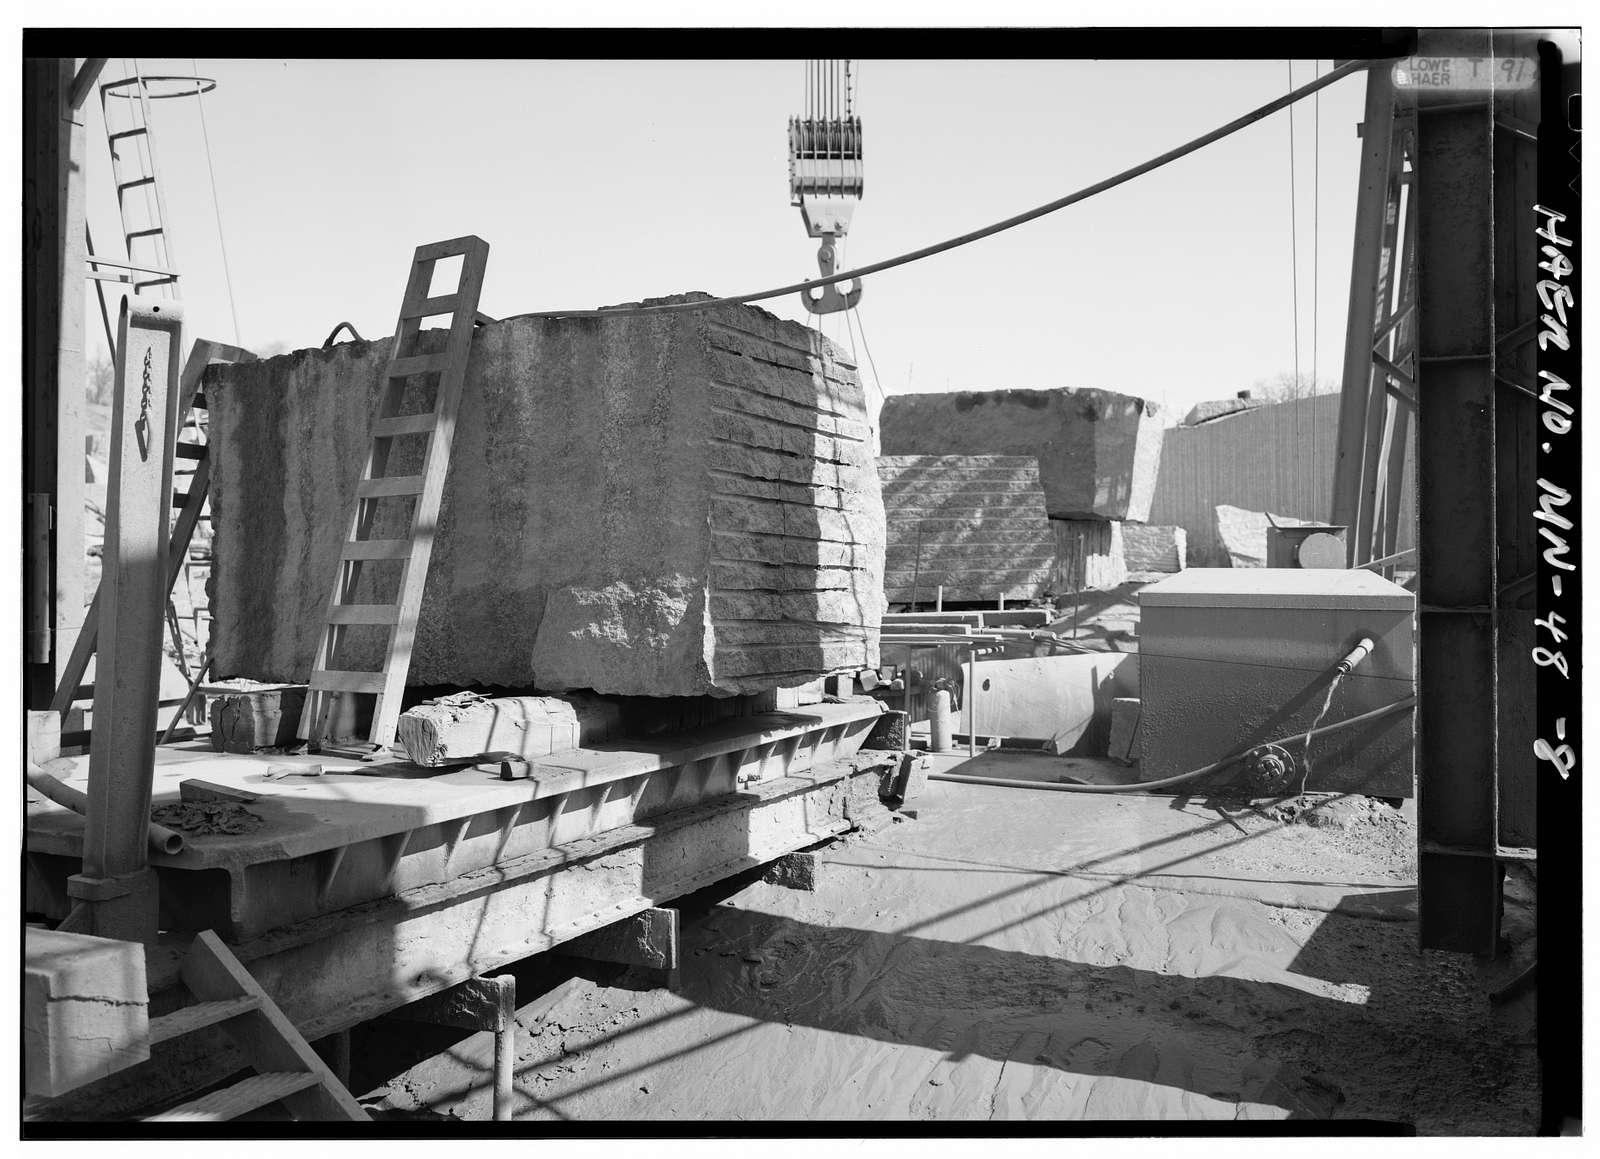 Clark & McCormack Quarry, Minnesota Highway 23 at Pine Street, Rockville, Stearns County, MN